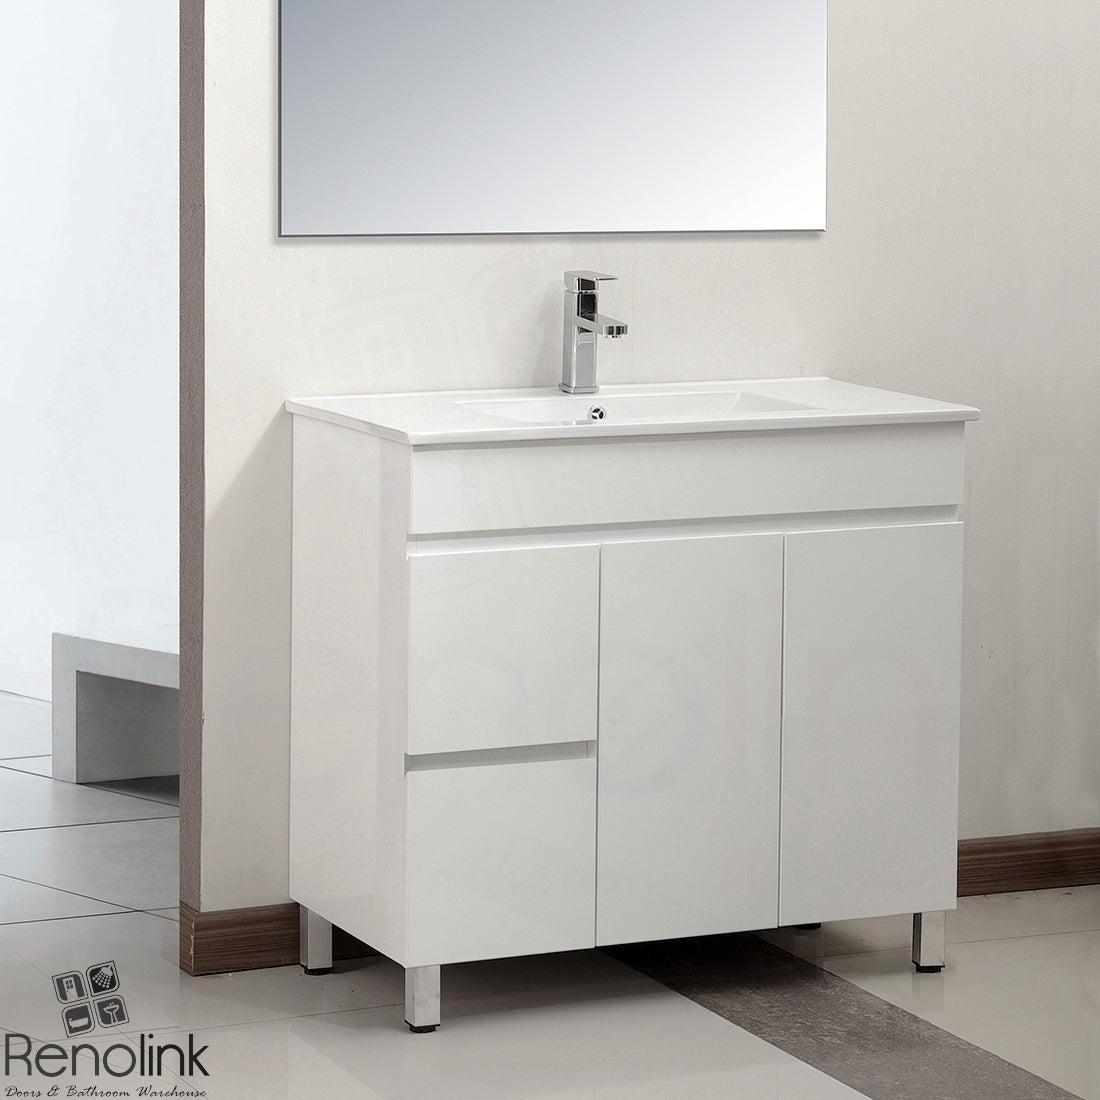 Renolink Lucena 900mm Slimline Narrow Left Drawer Bathroom Cabinet Finger Pull White Poly